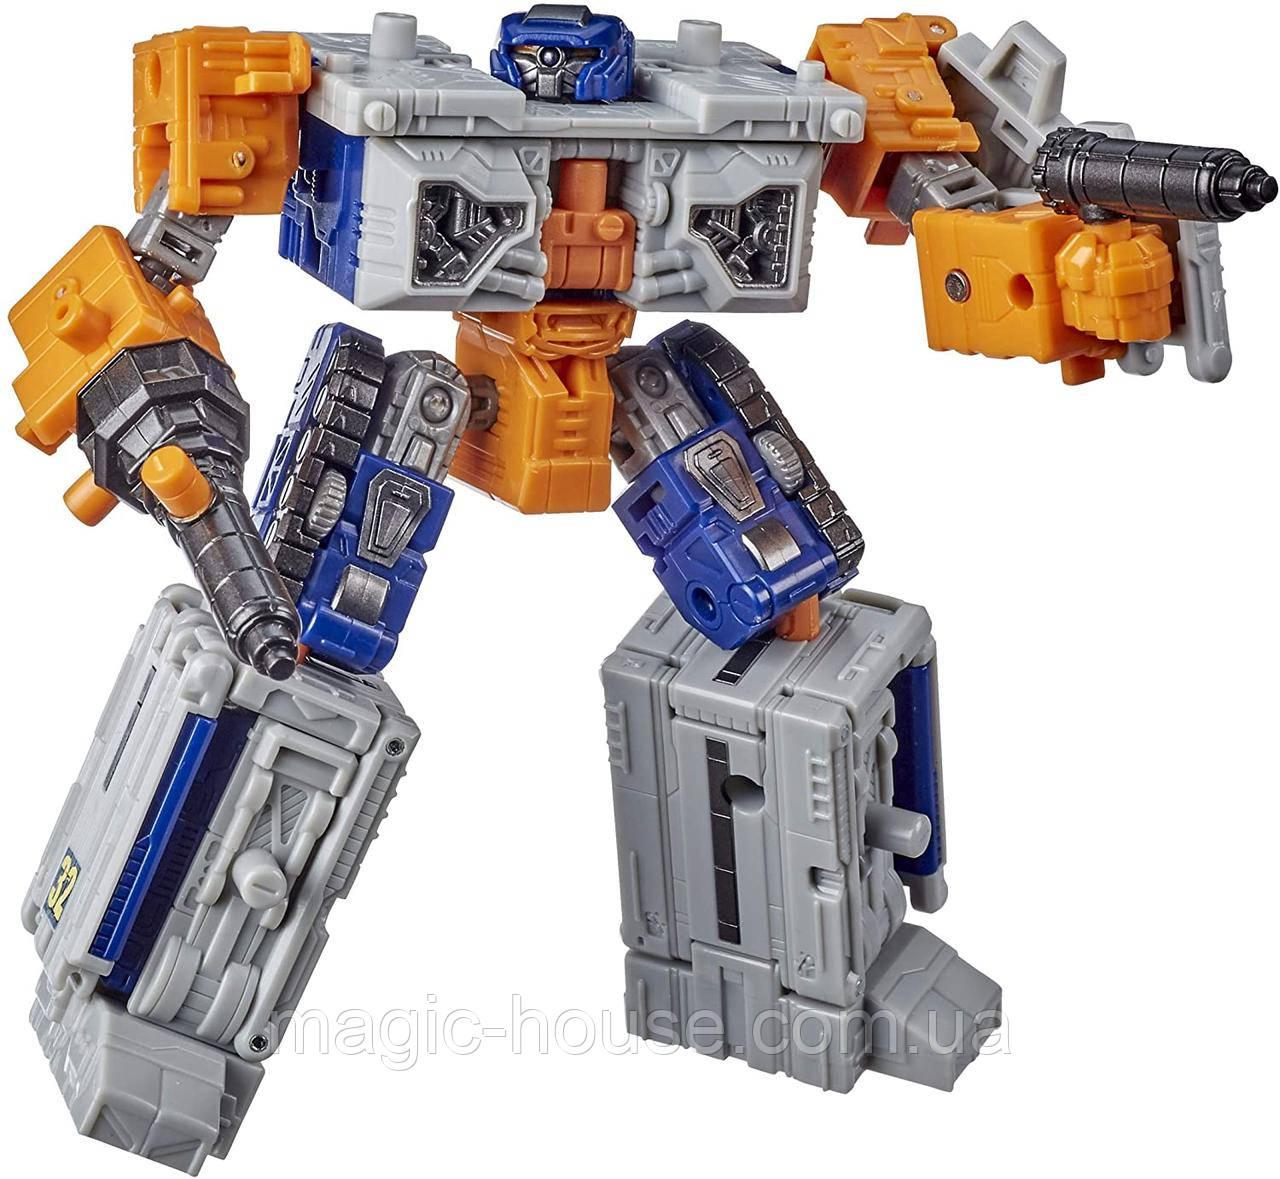 Трансформер Airwave війна за Transformers Cybertron Toys Generations War for Cybertron Оригінал